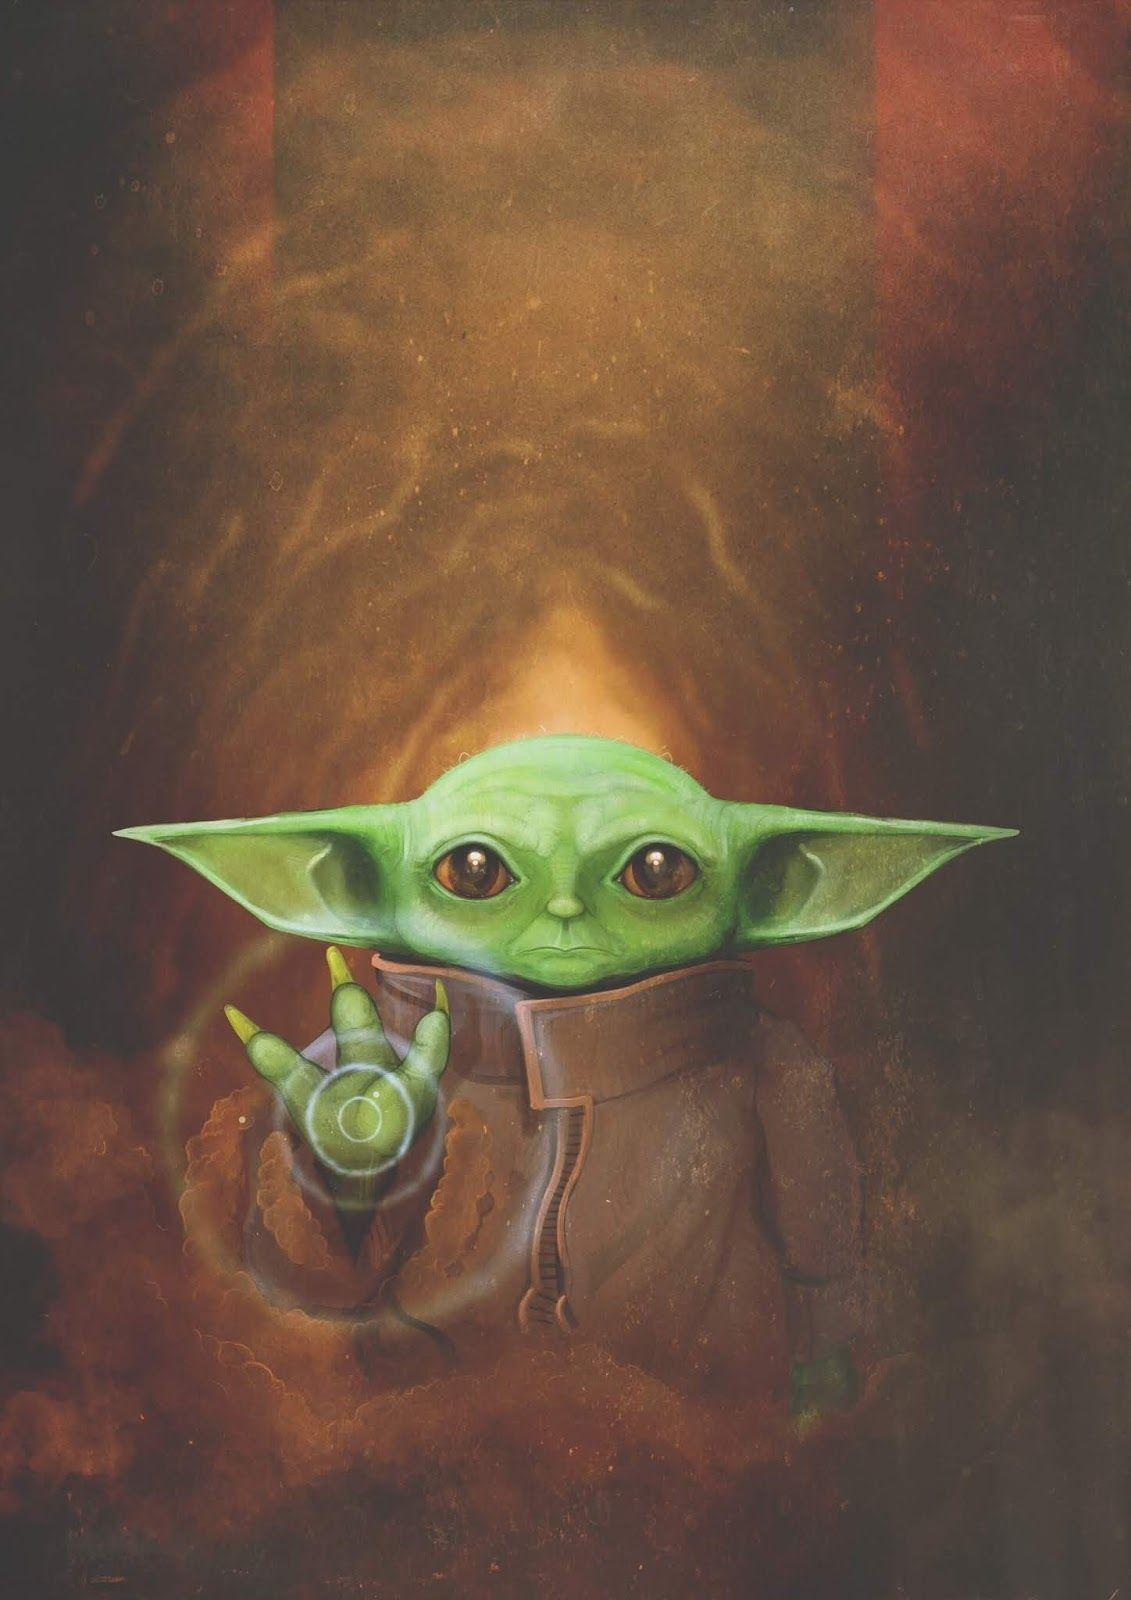 Cute Baby Yoda Wallpapers Wallpaper Cave